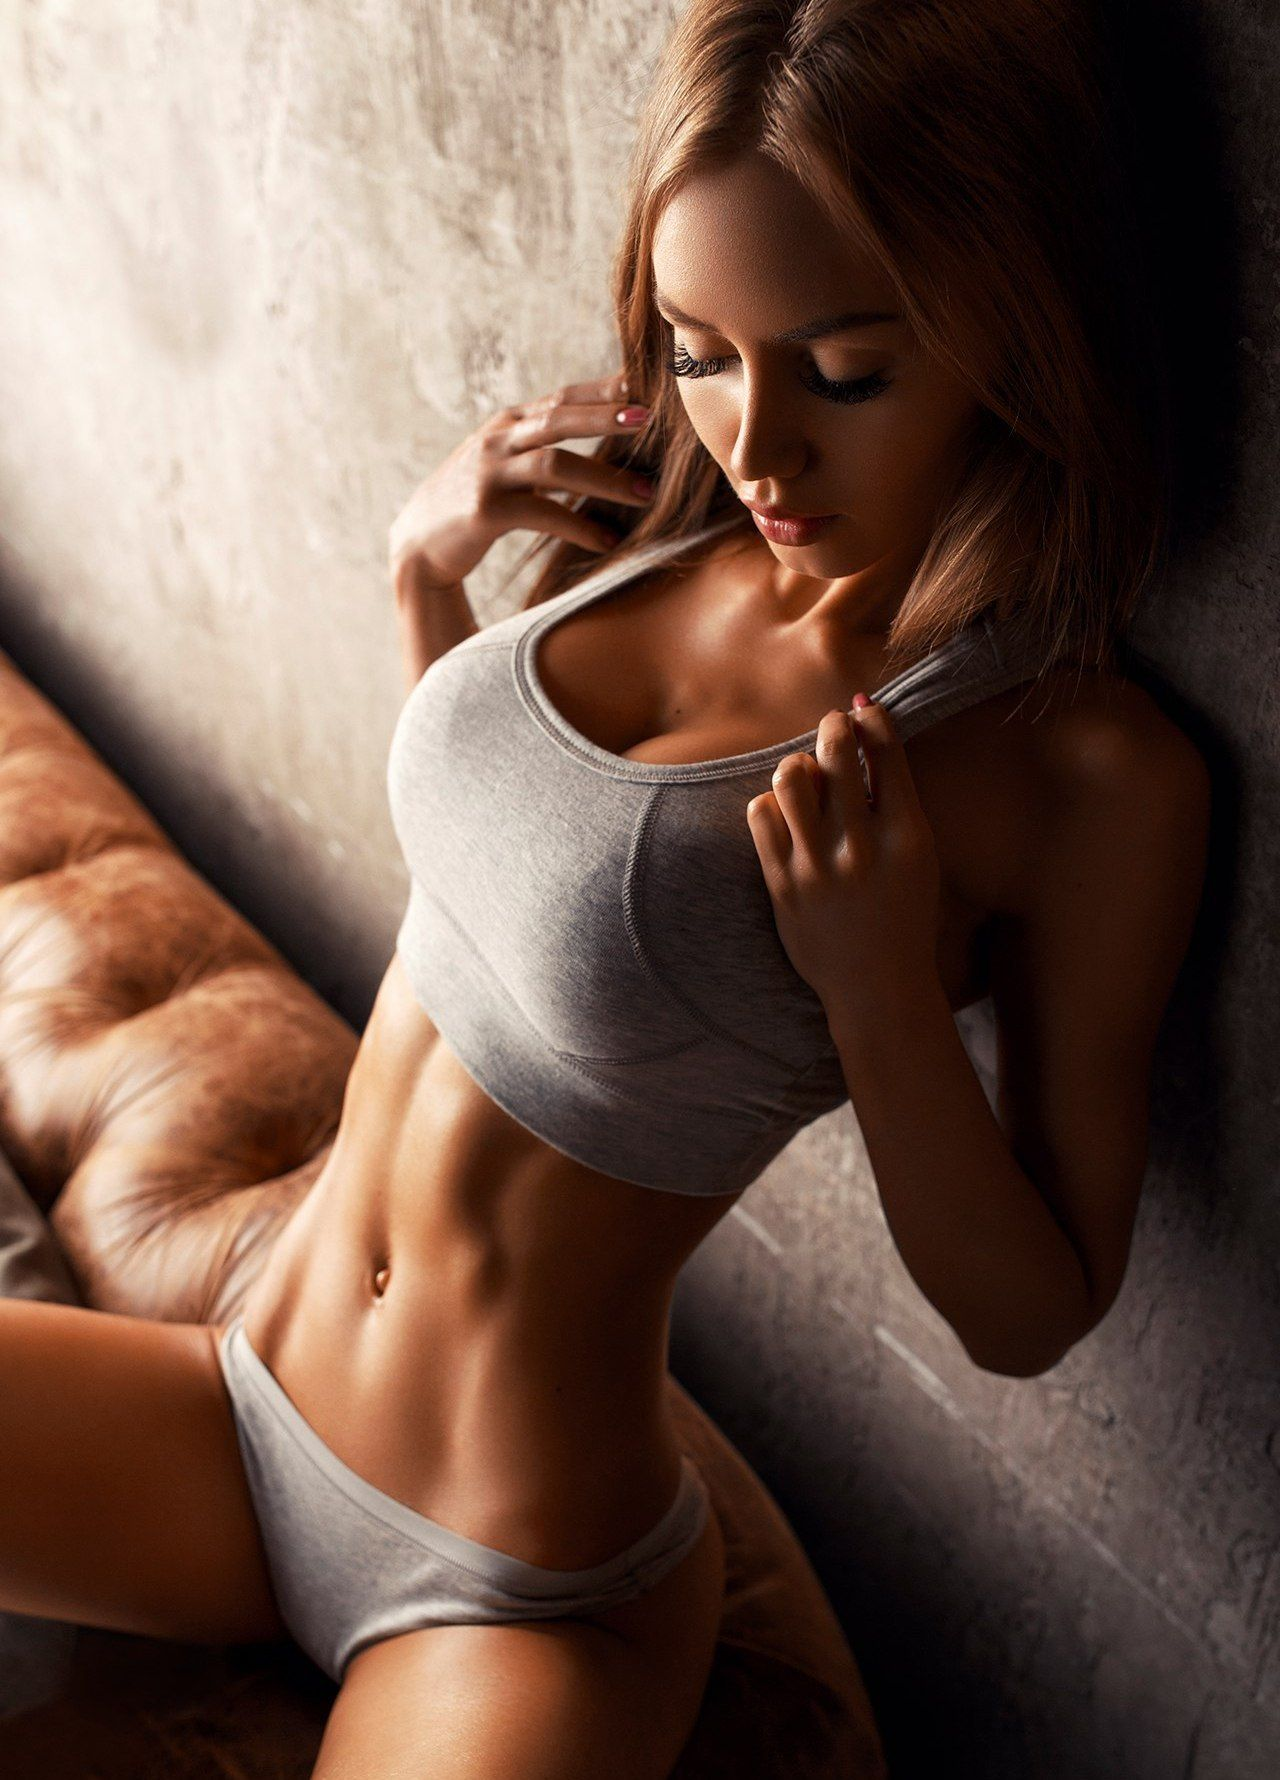 Body girl sexy